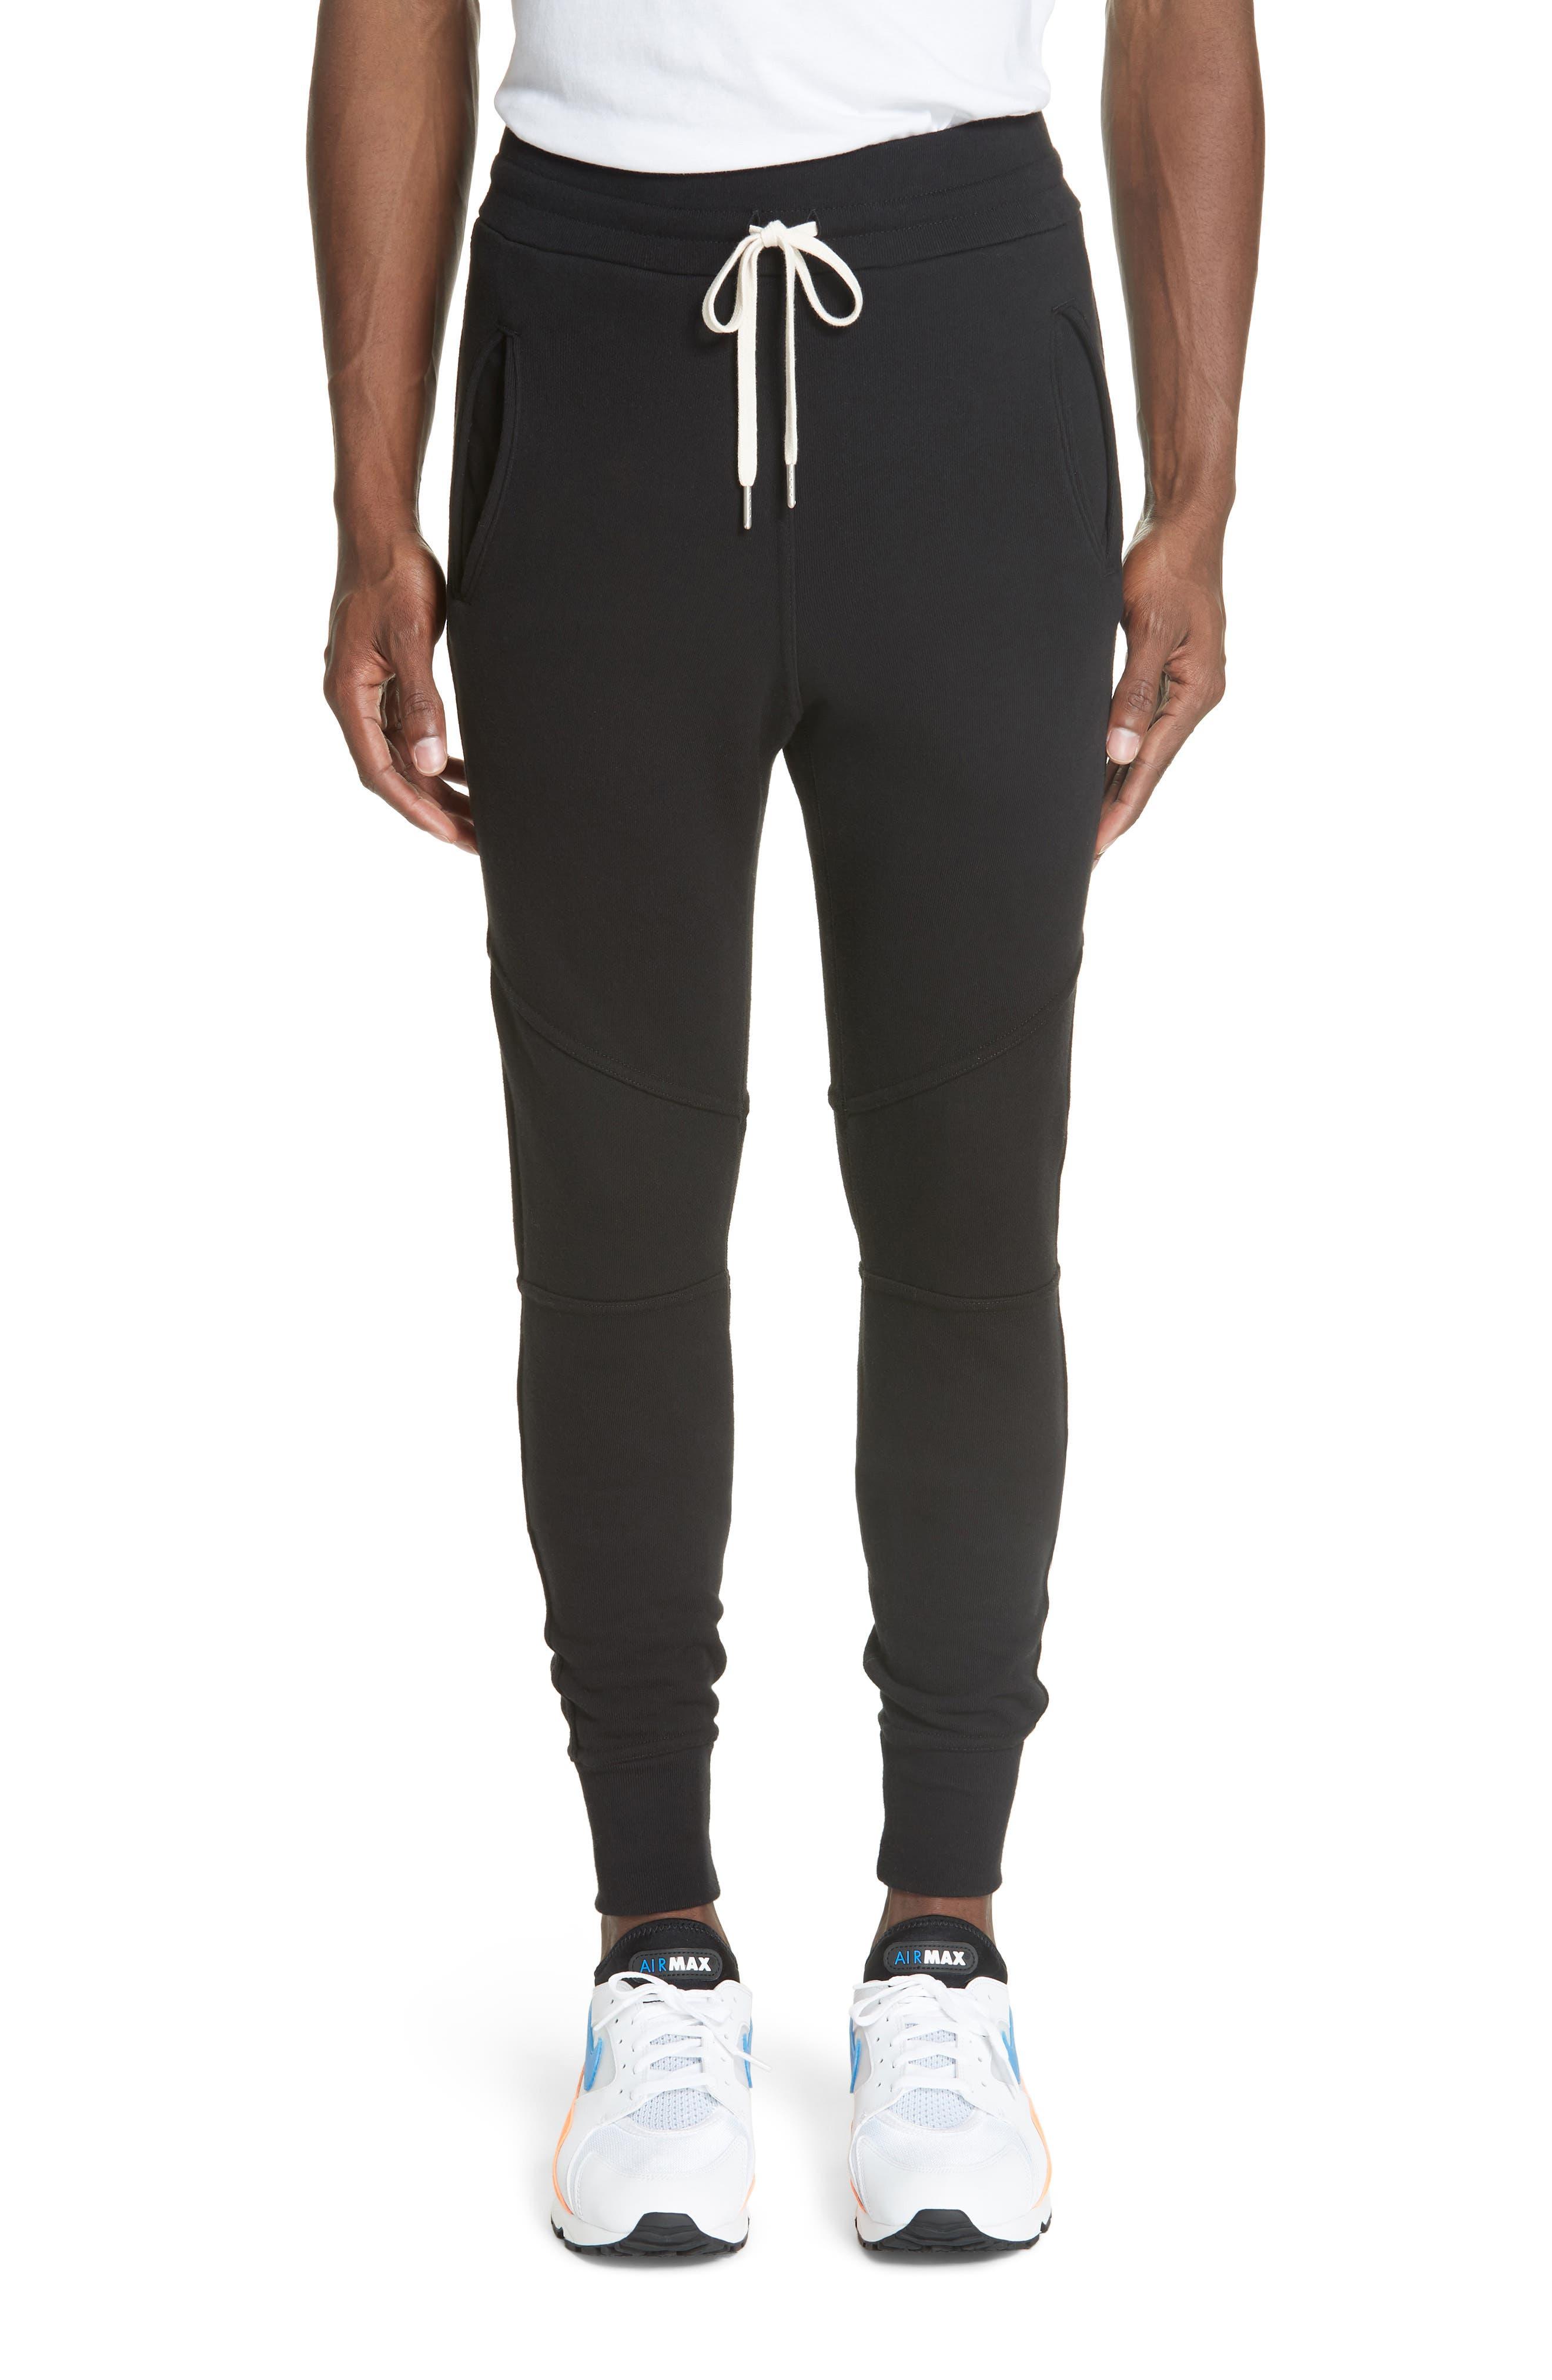 JOHN ELLIOTT Escobar Sweatpants, Main, color, BLACK